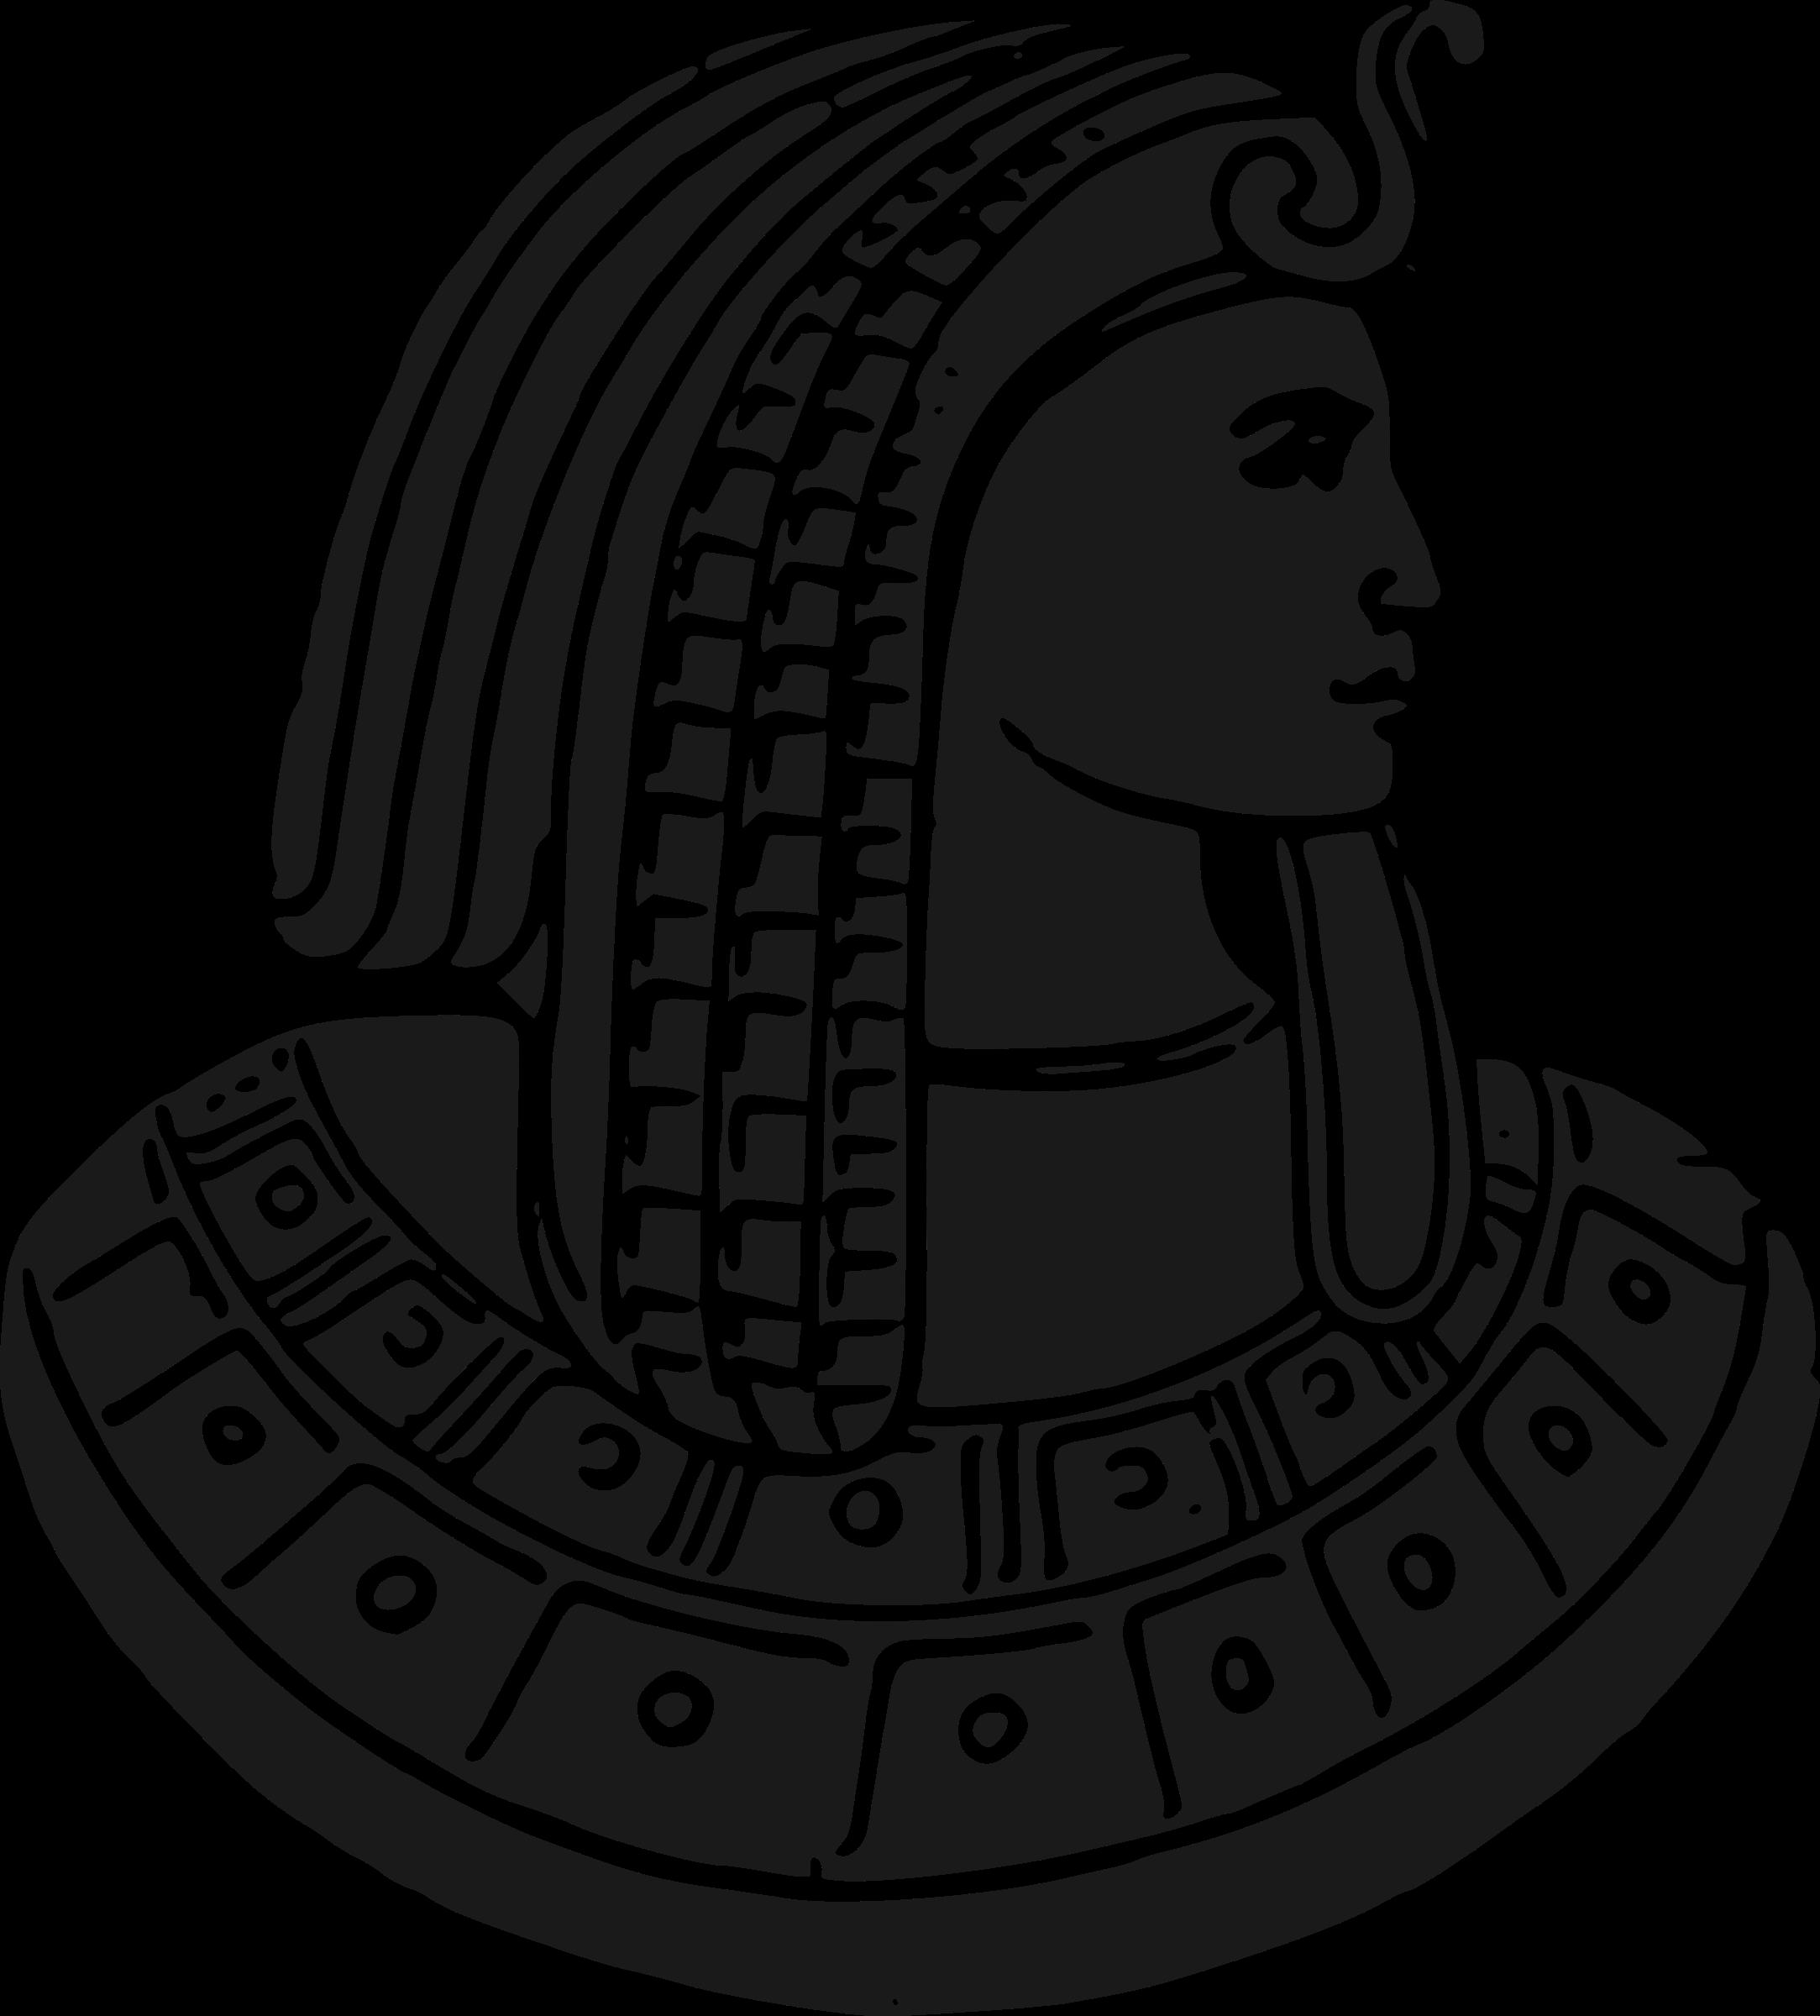 BIG IMAGE (PNG) - PNG Pharaoh